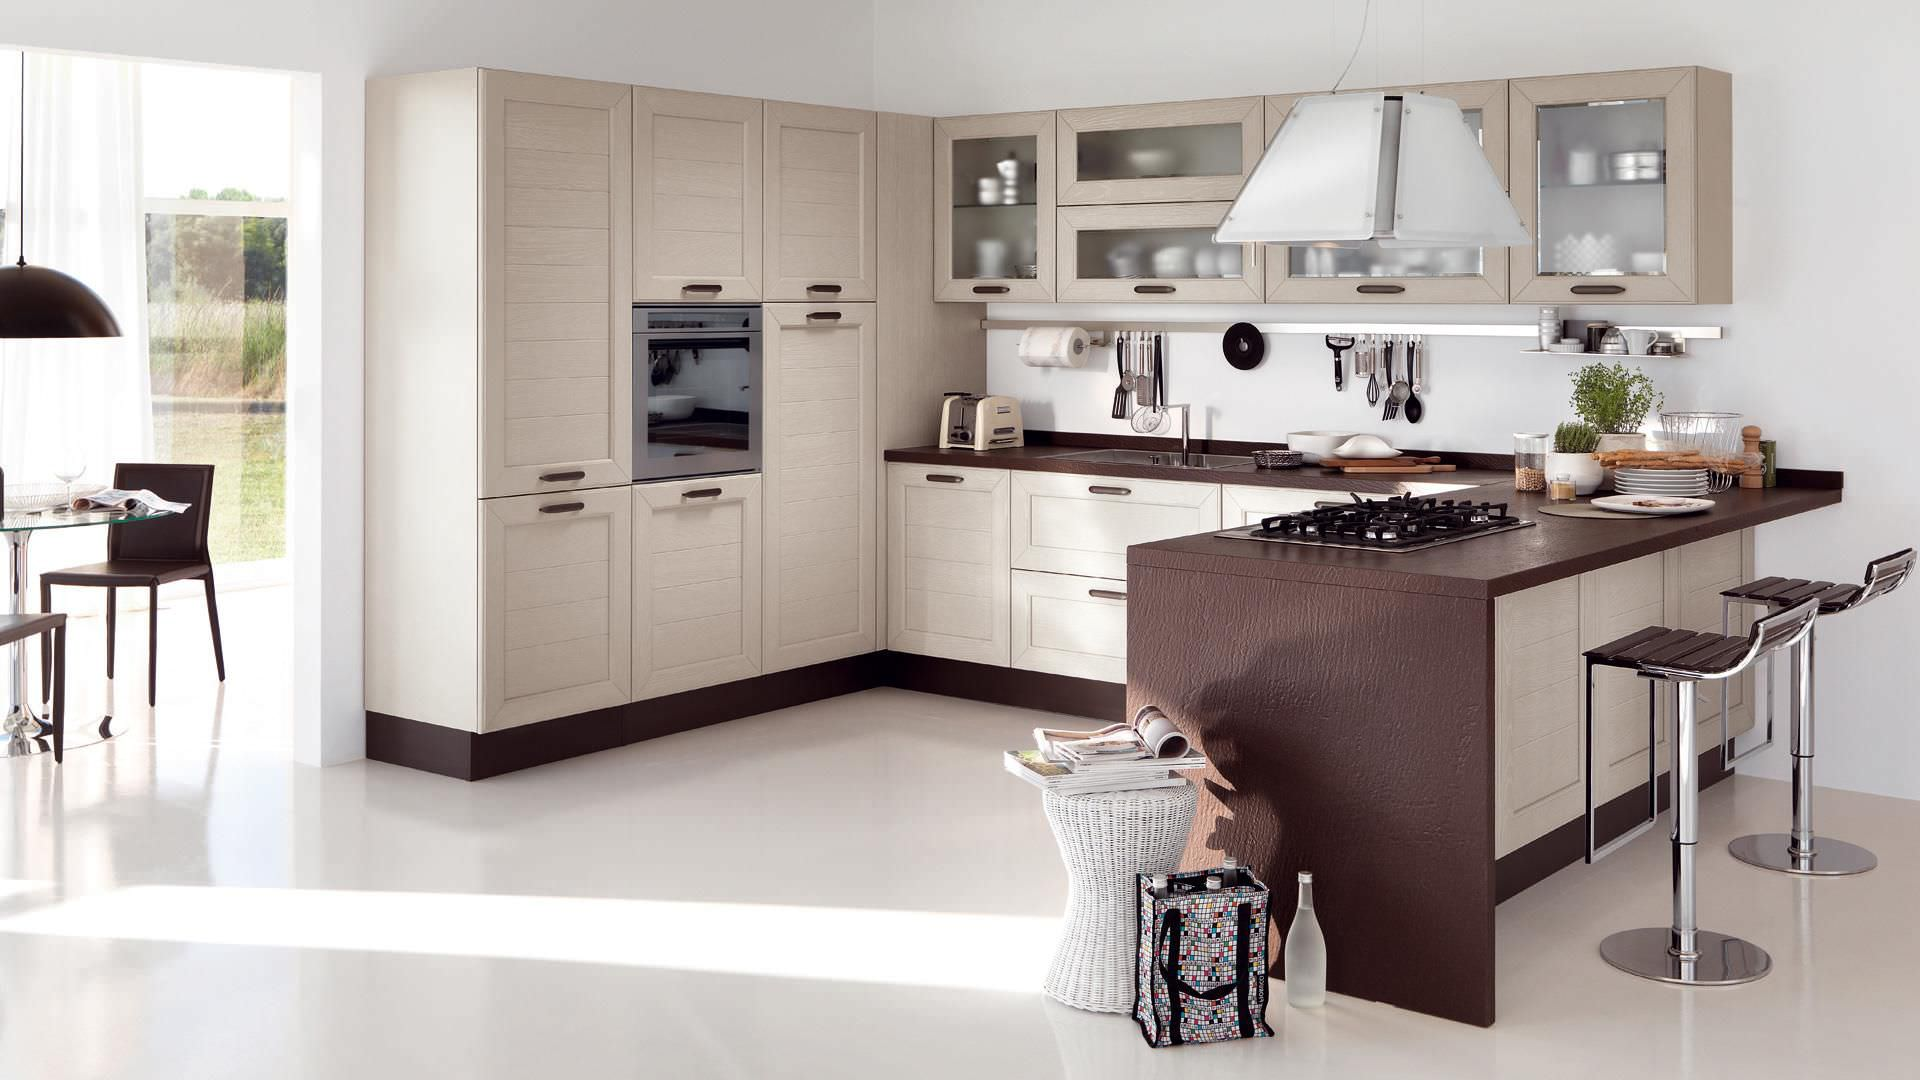 Moderne Küche / Holz - CLAUDIA - CUCINE LUBE - Videos